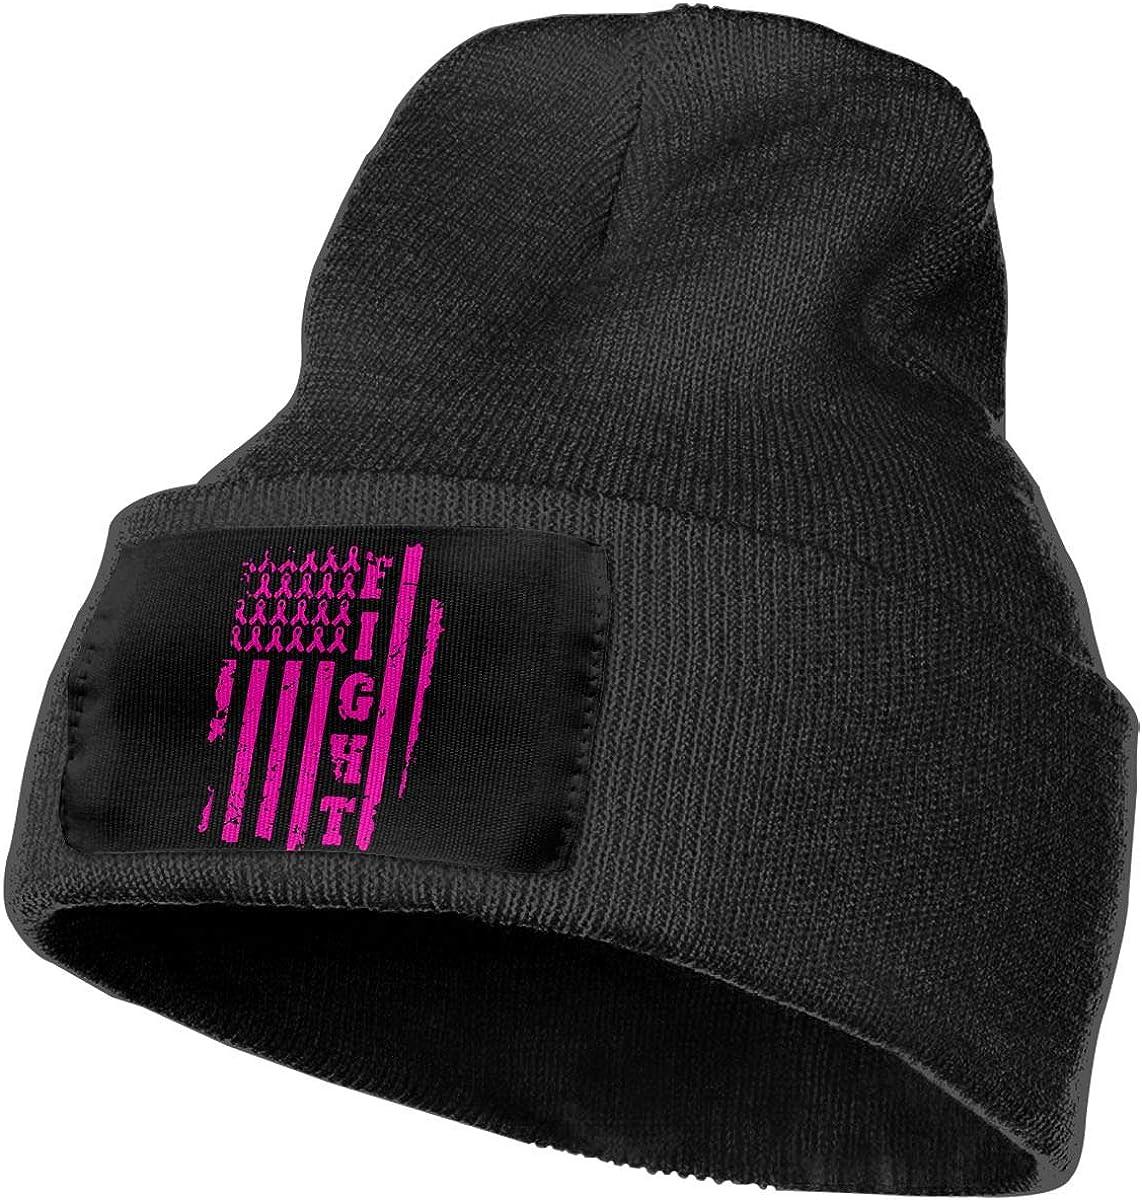 COLLJL-8 Men /& Women Cancer Awareness Pink USA Flag Outdoor Stretch Knit Beanies Hat Soft Winter Knit Caps